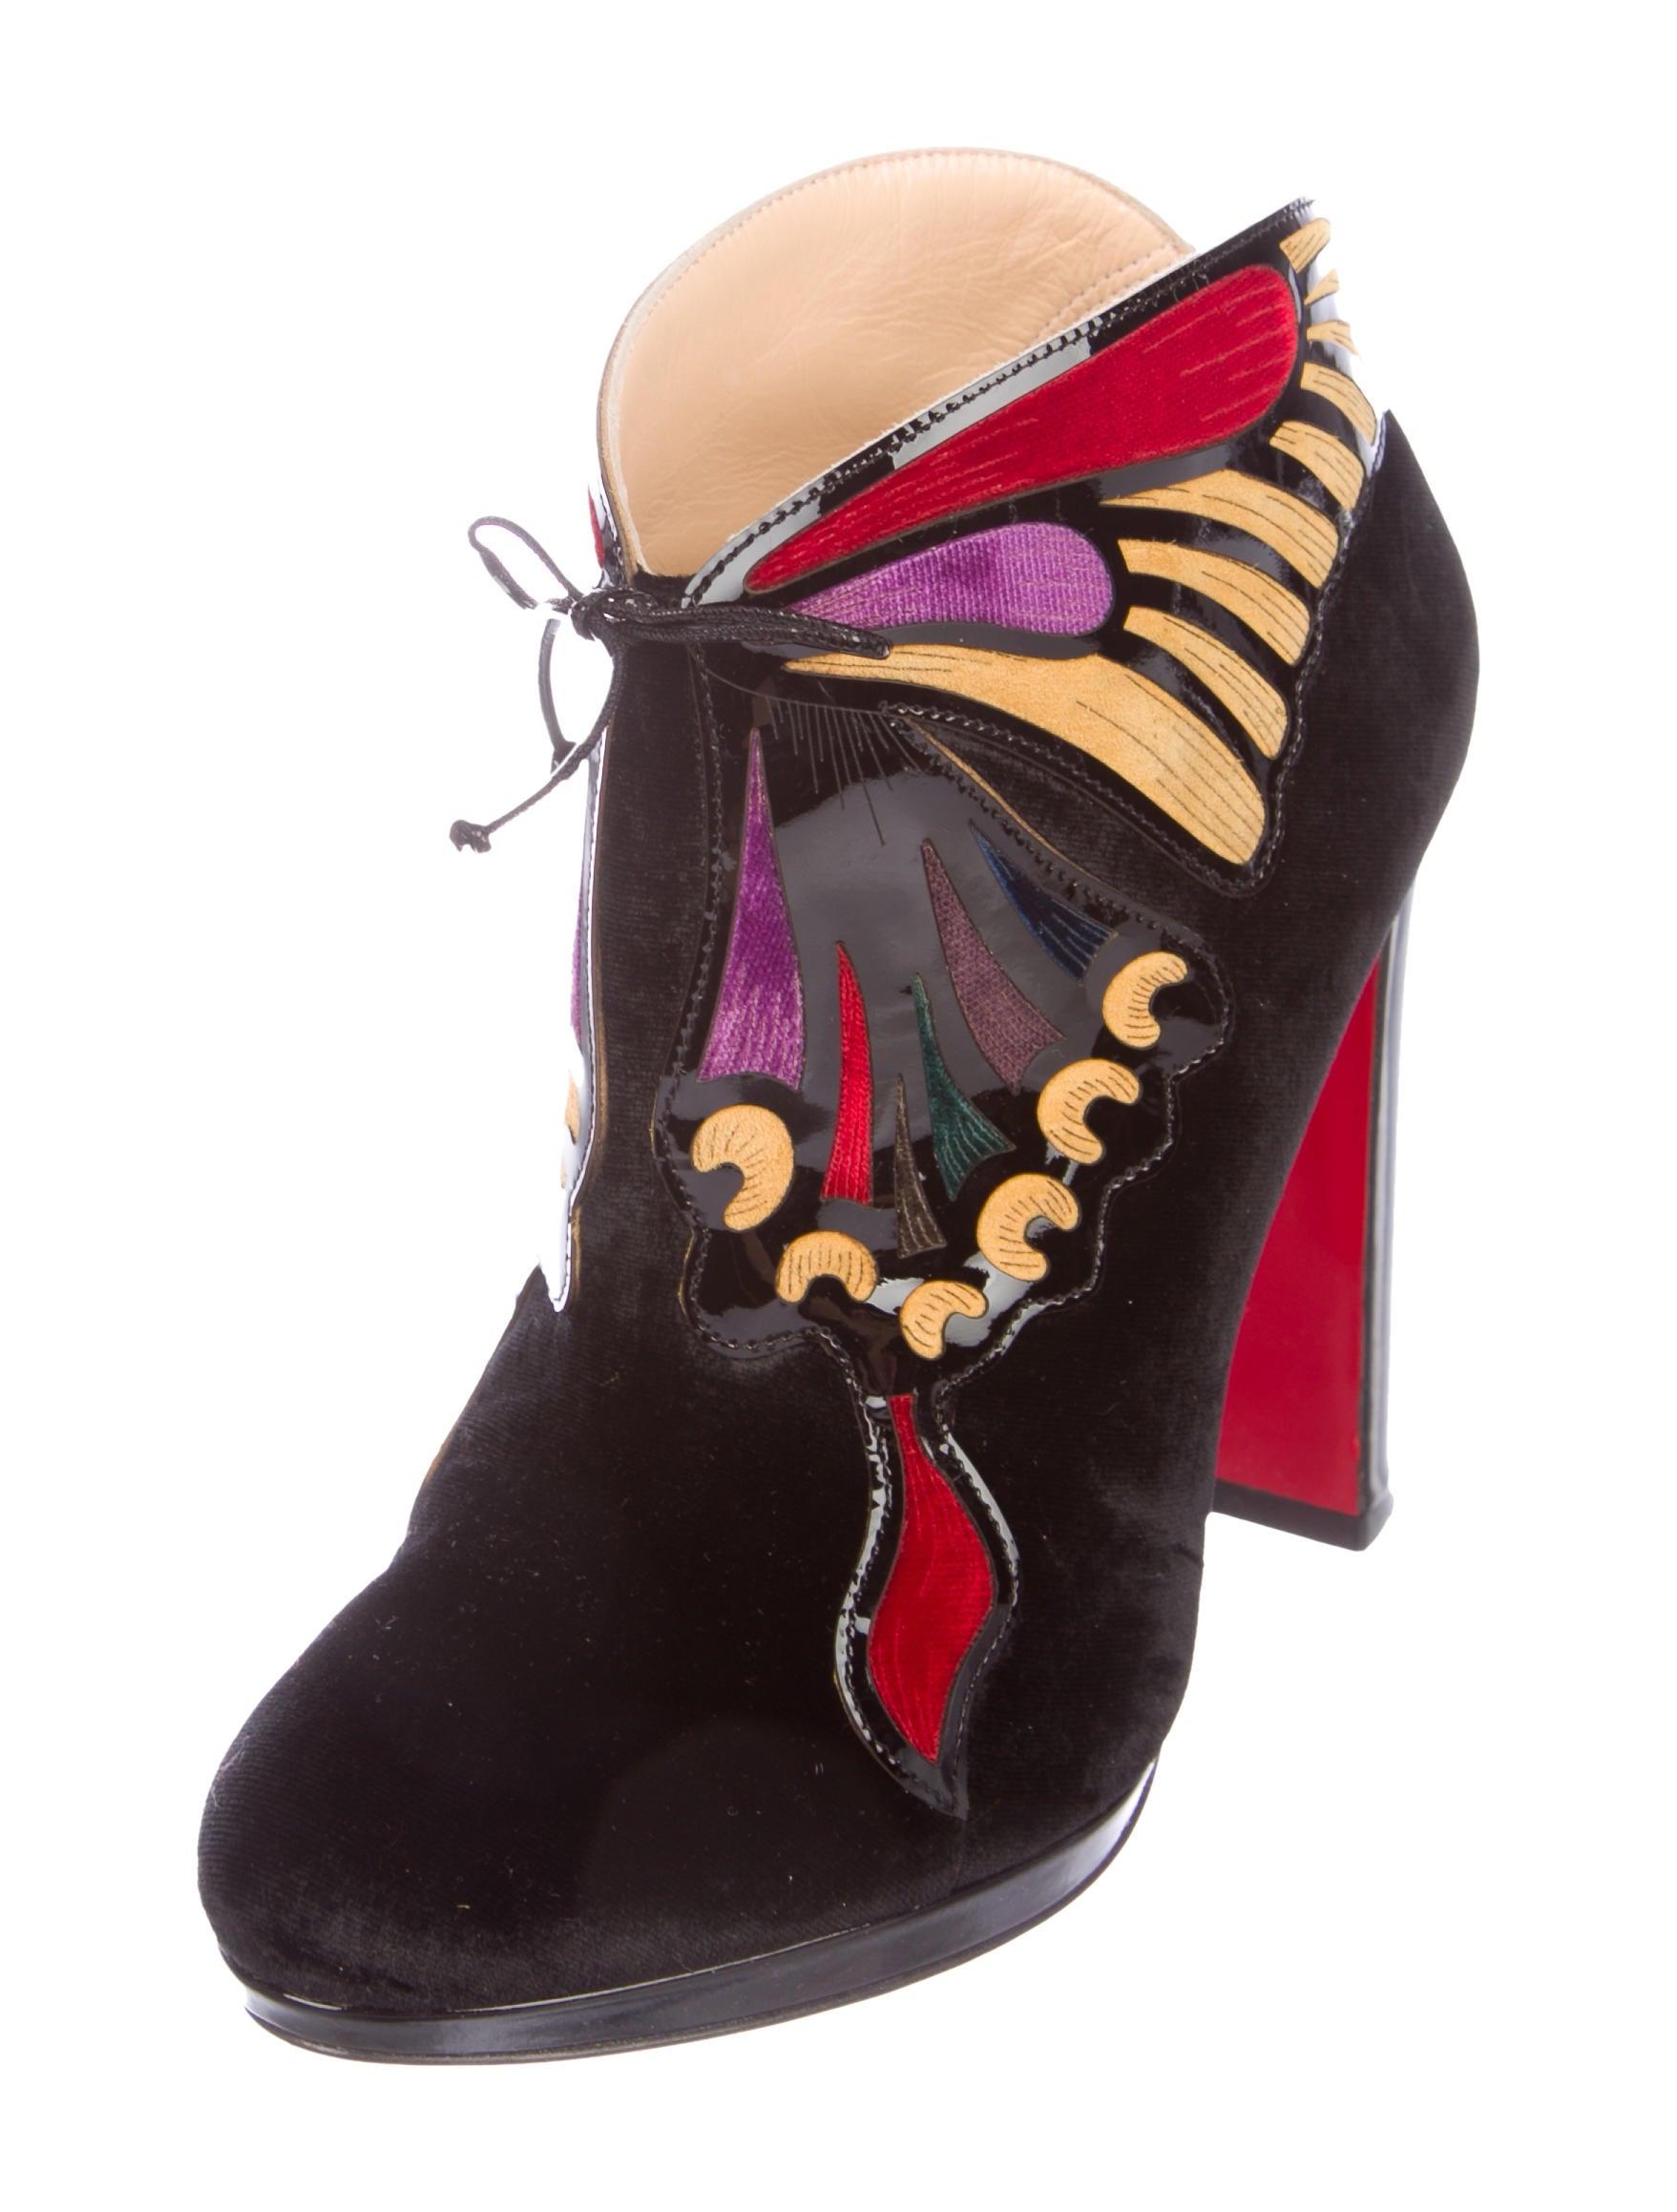 Christian Louboutin Mariposa 120 Velvet Ankle Boots clearance latest auVyD